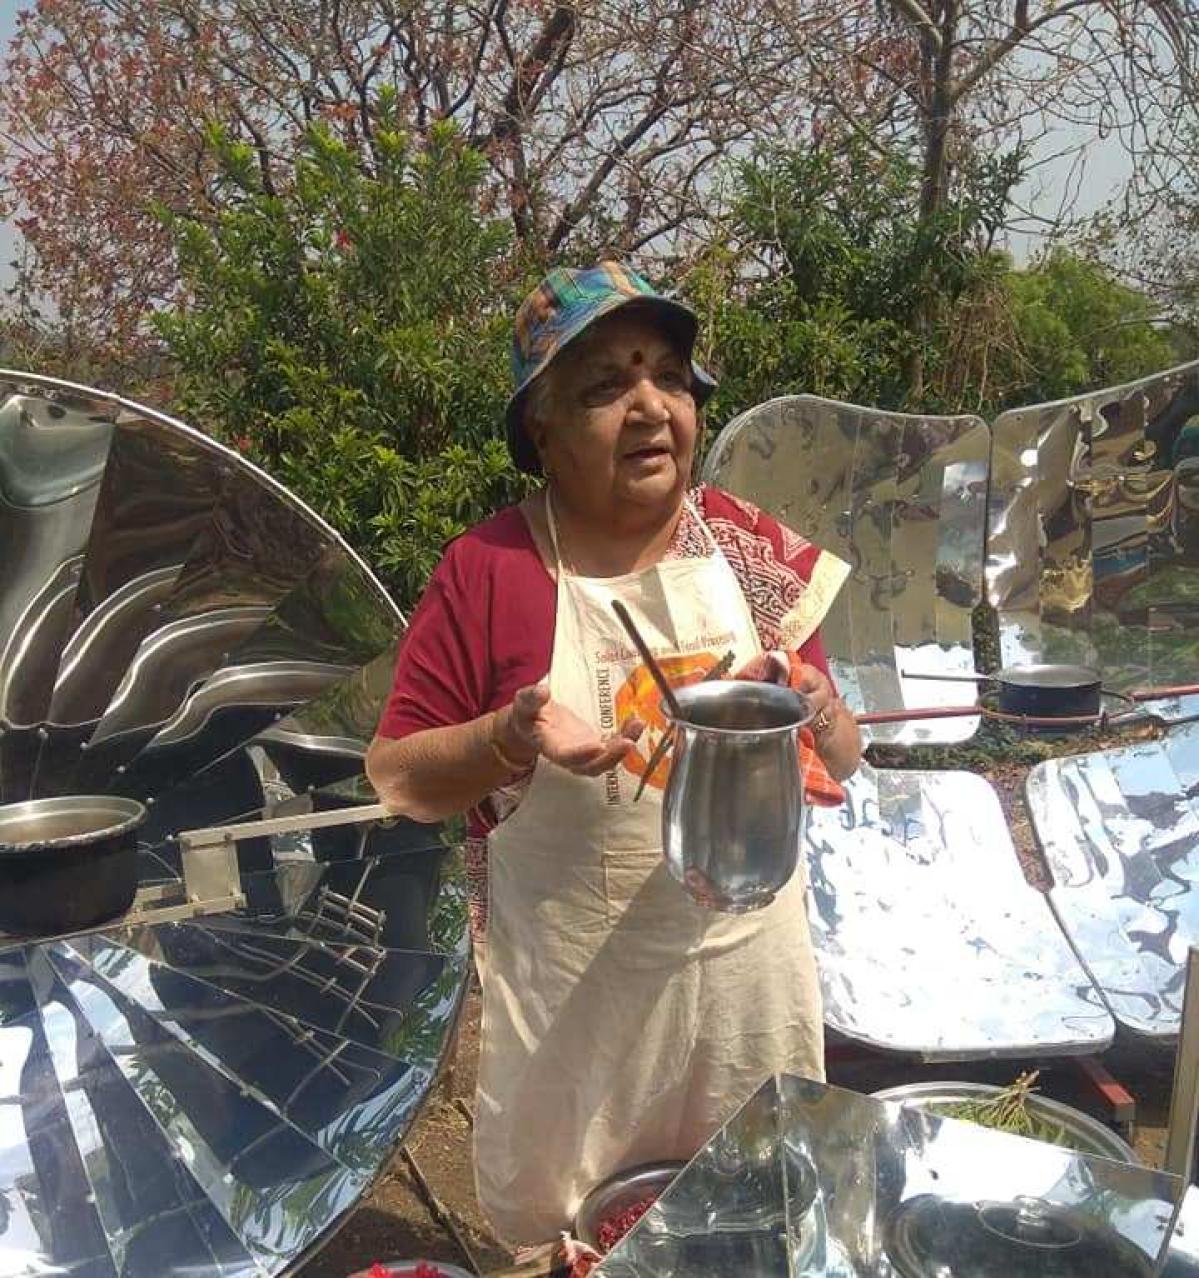 Janak Palta McGilligan offering tips on solar cooking